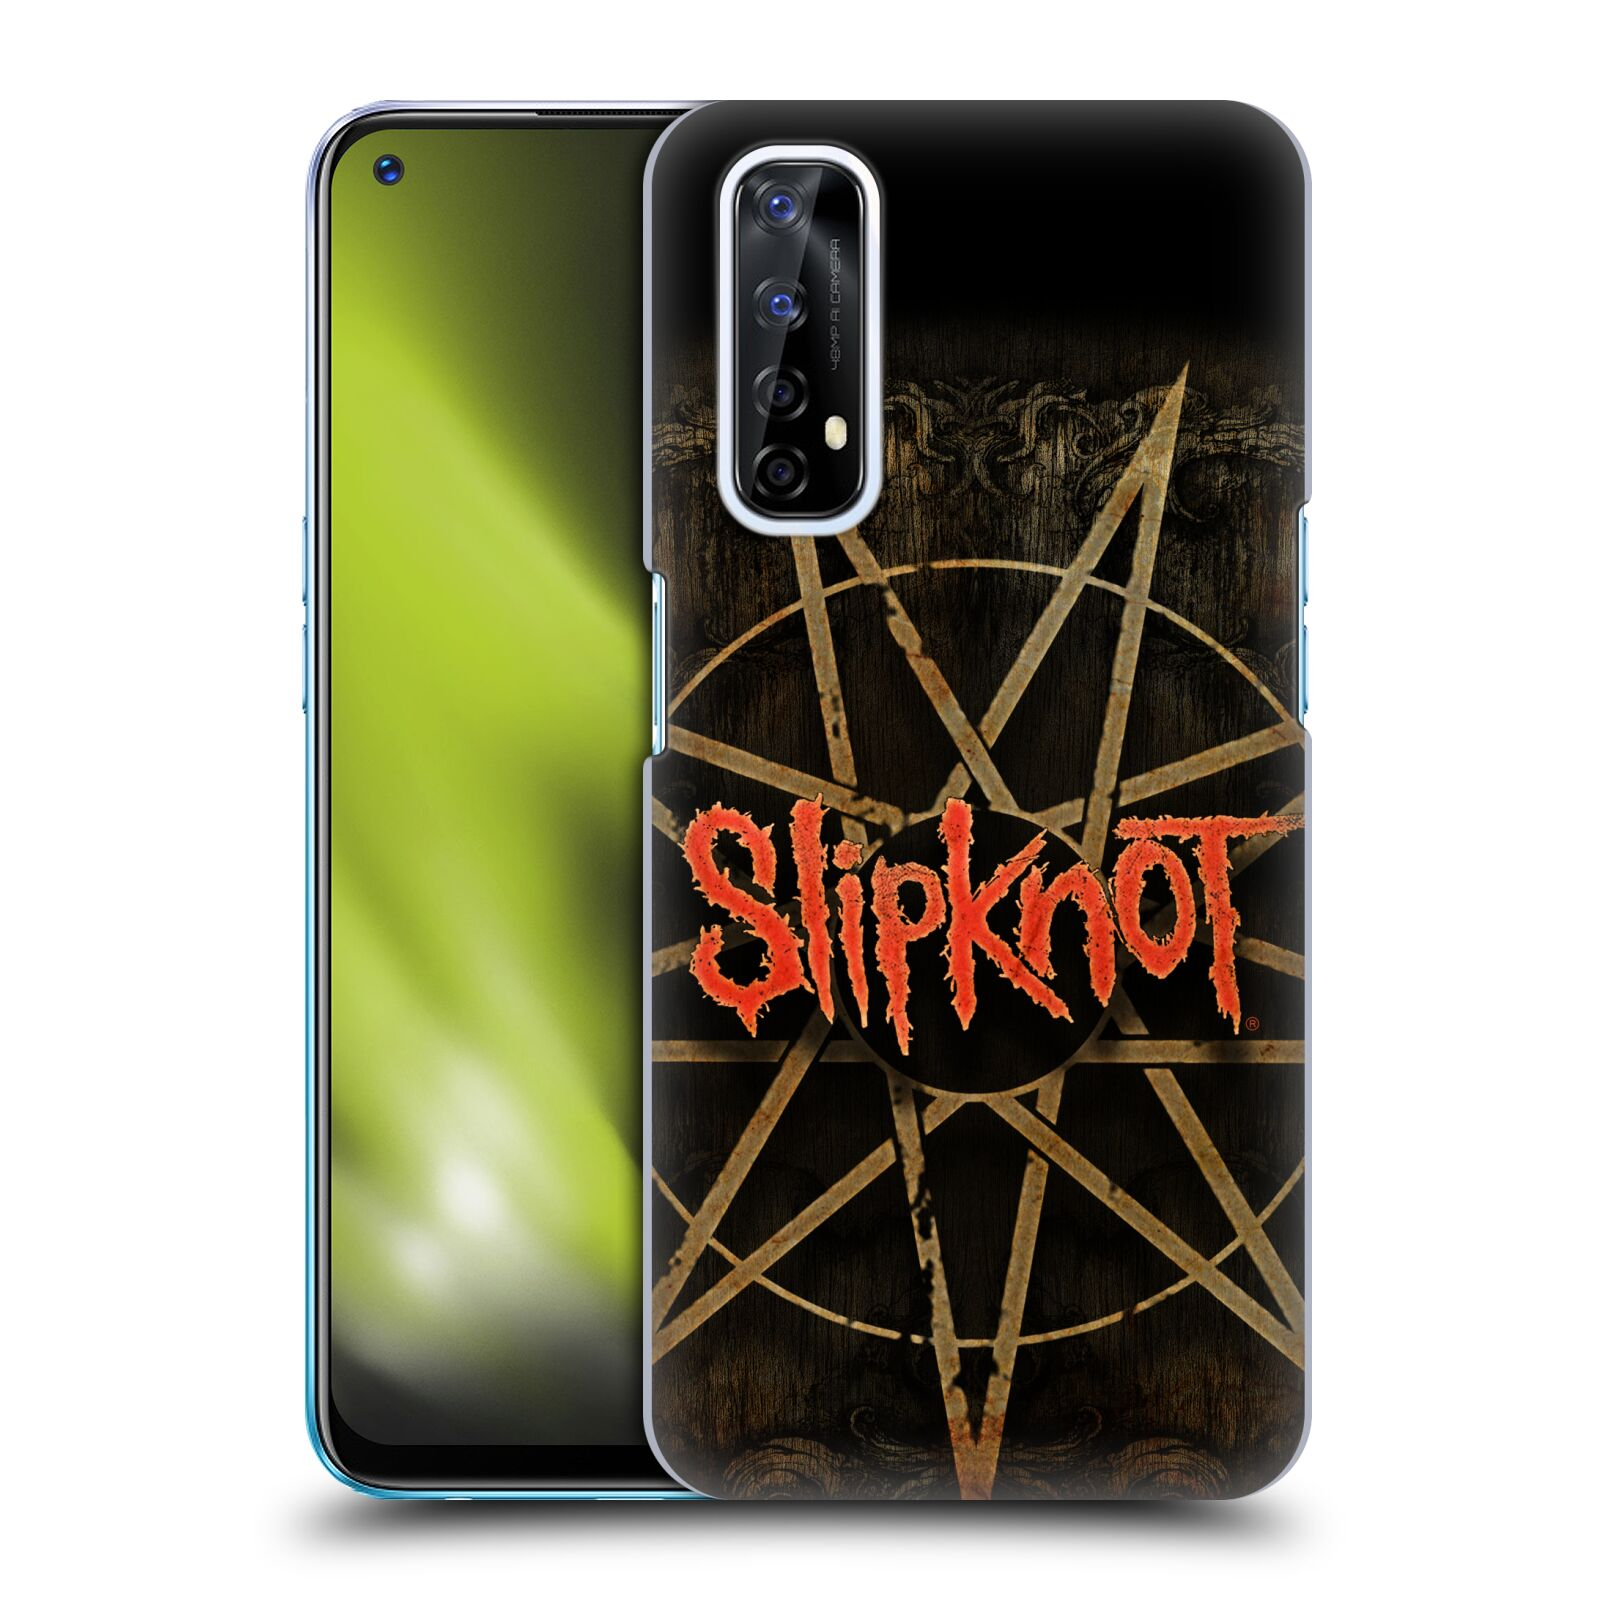 Plastové pouzdro na mobil Realme 7 - Head Case - Slipknot - Znak